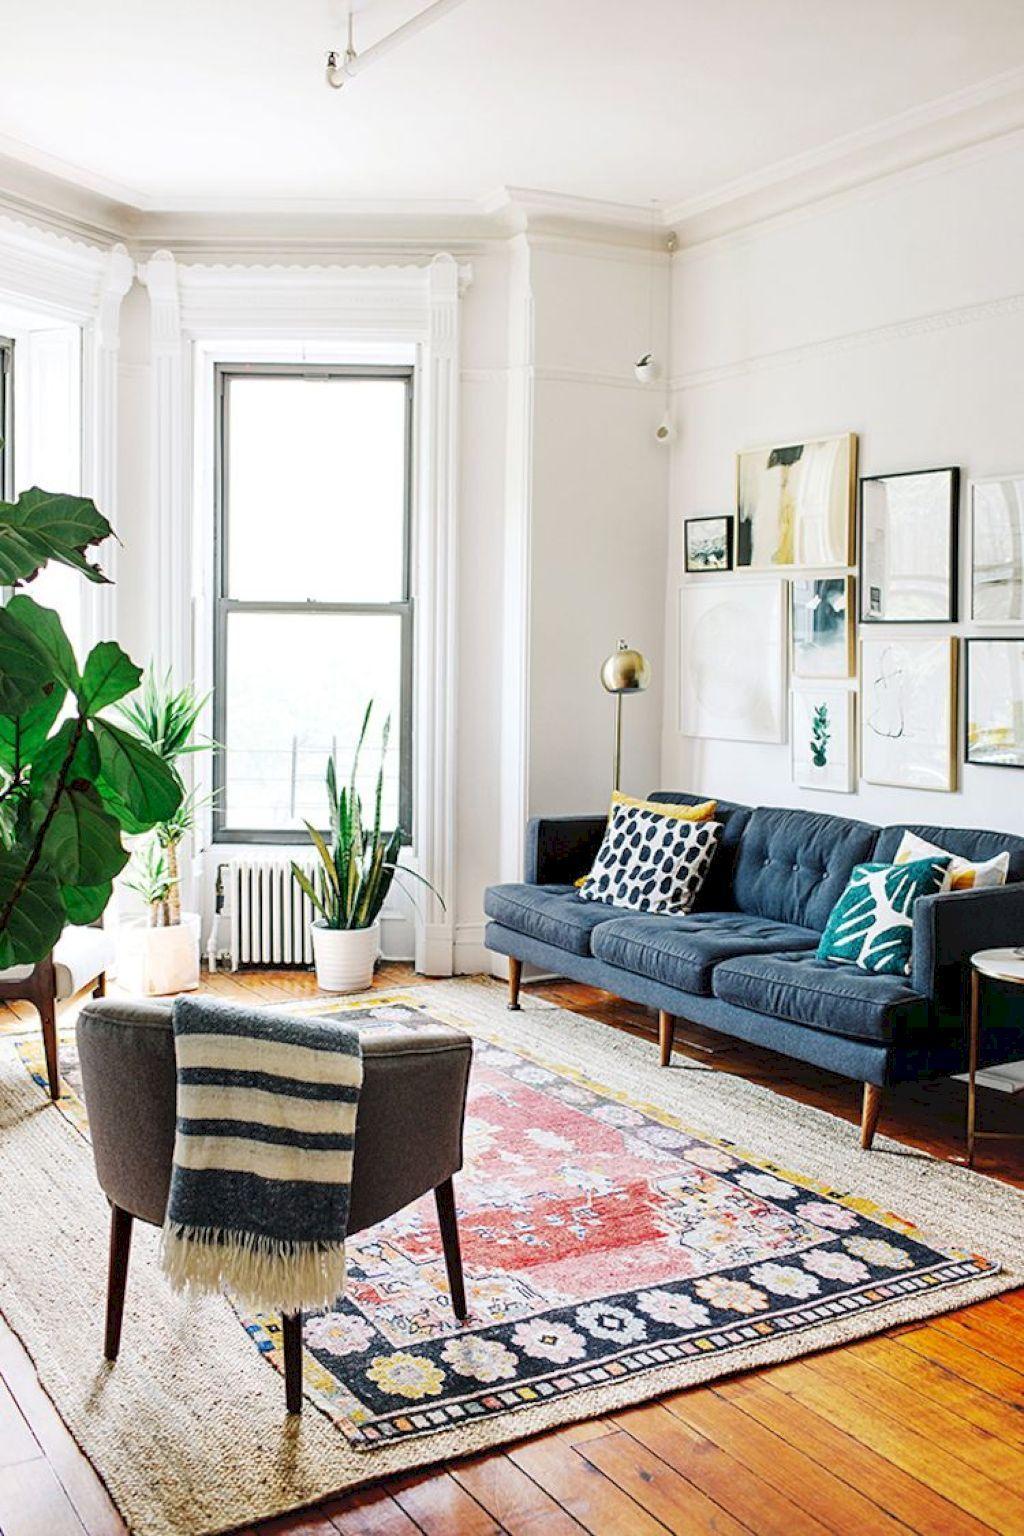 55 Gorgeous Bohemian Style Living Room Decor Ideas | Bohemian style ...